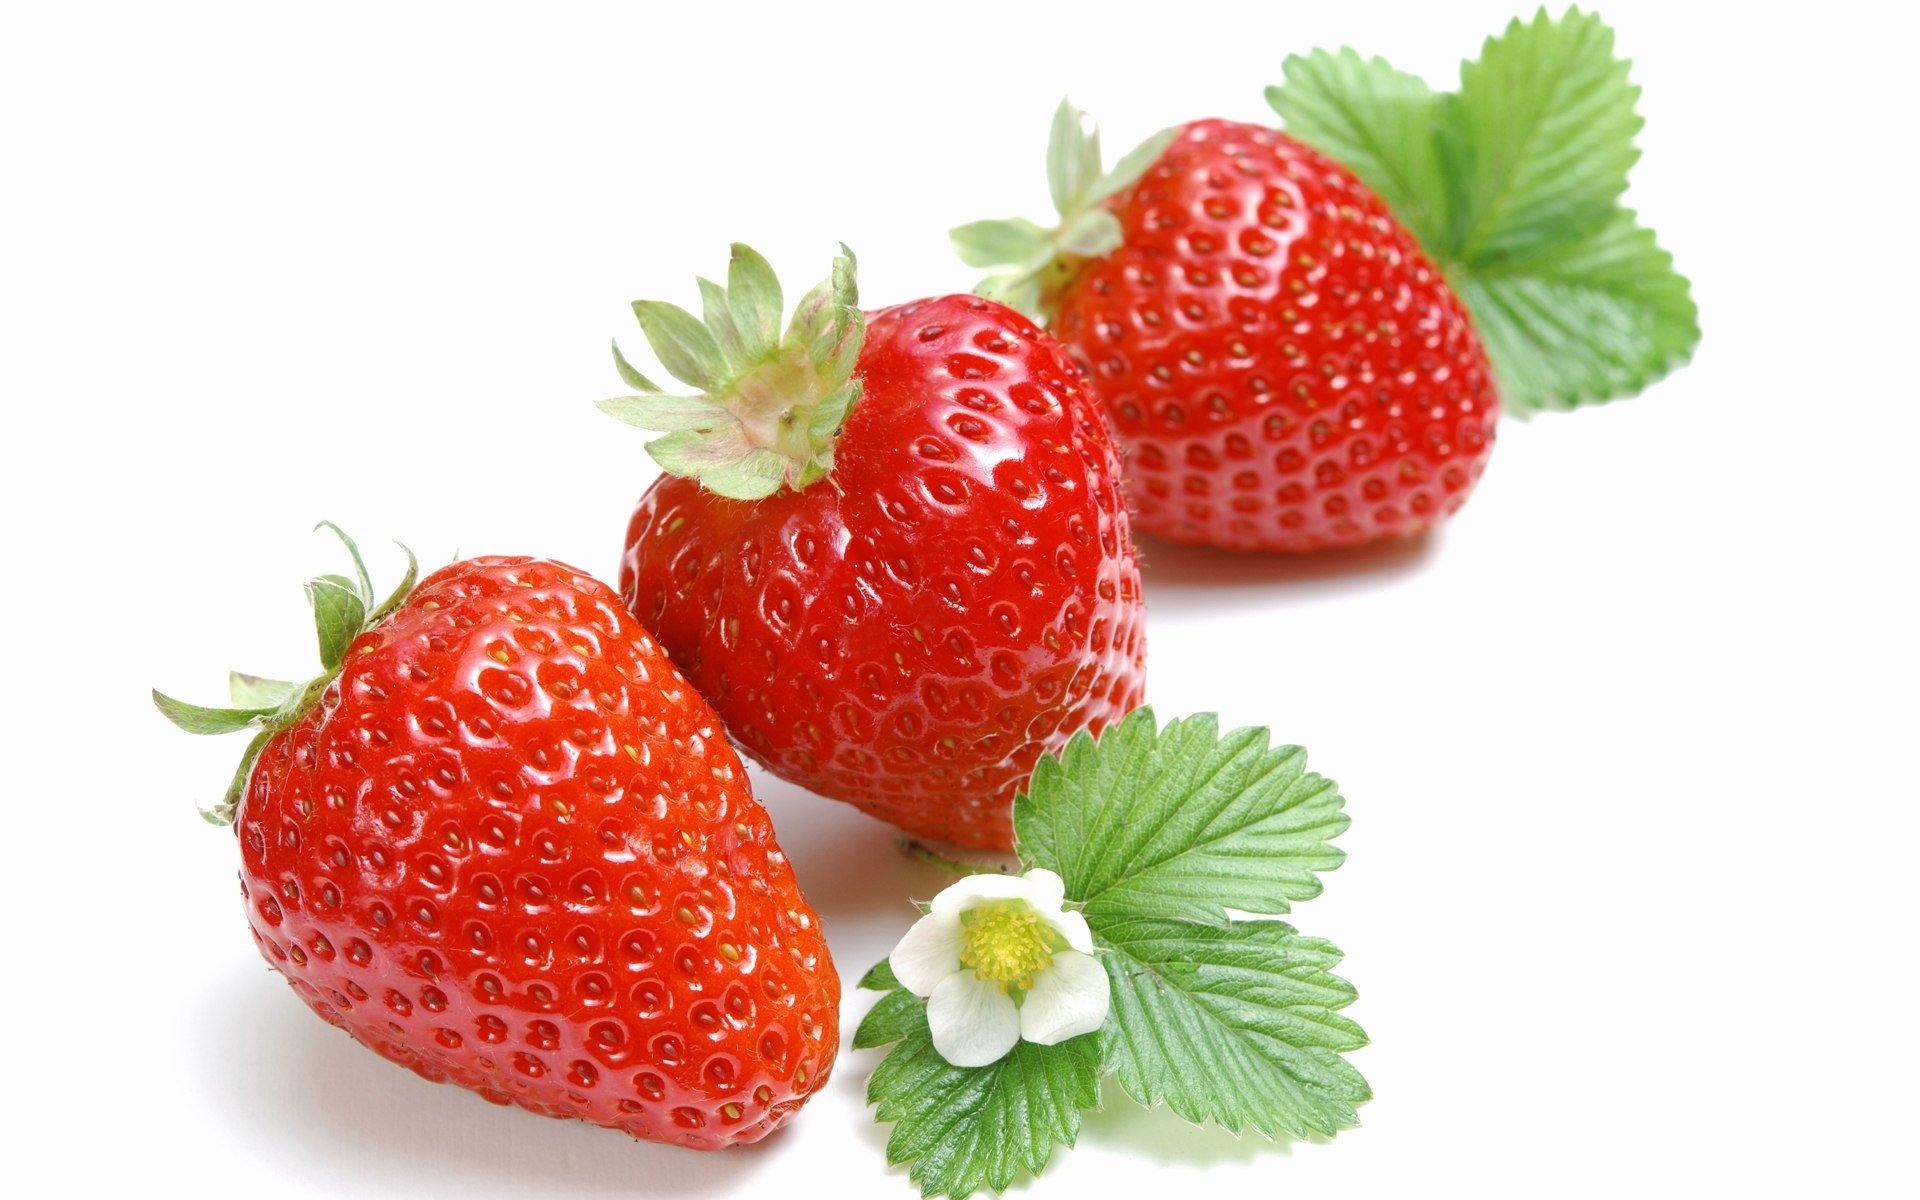 Food - Strawberry  Wallpaper